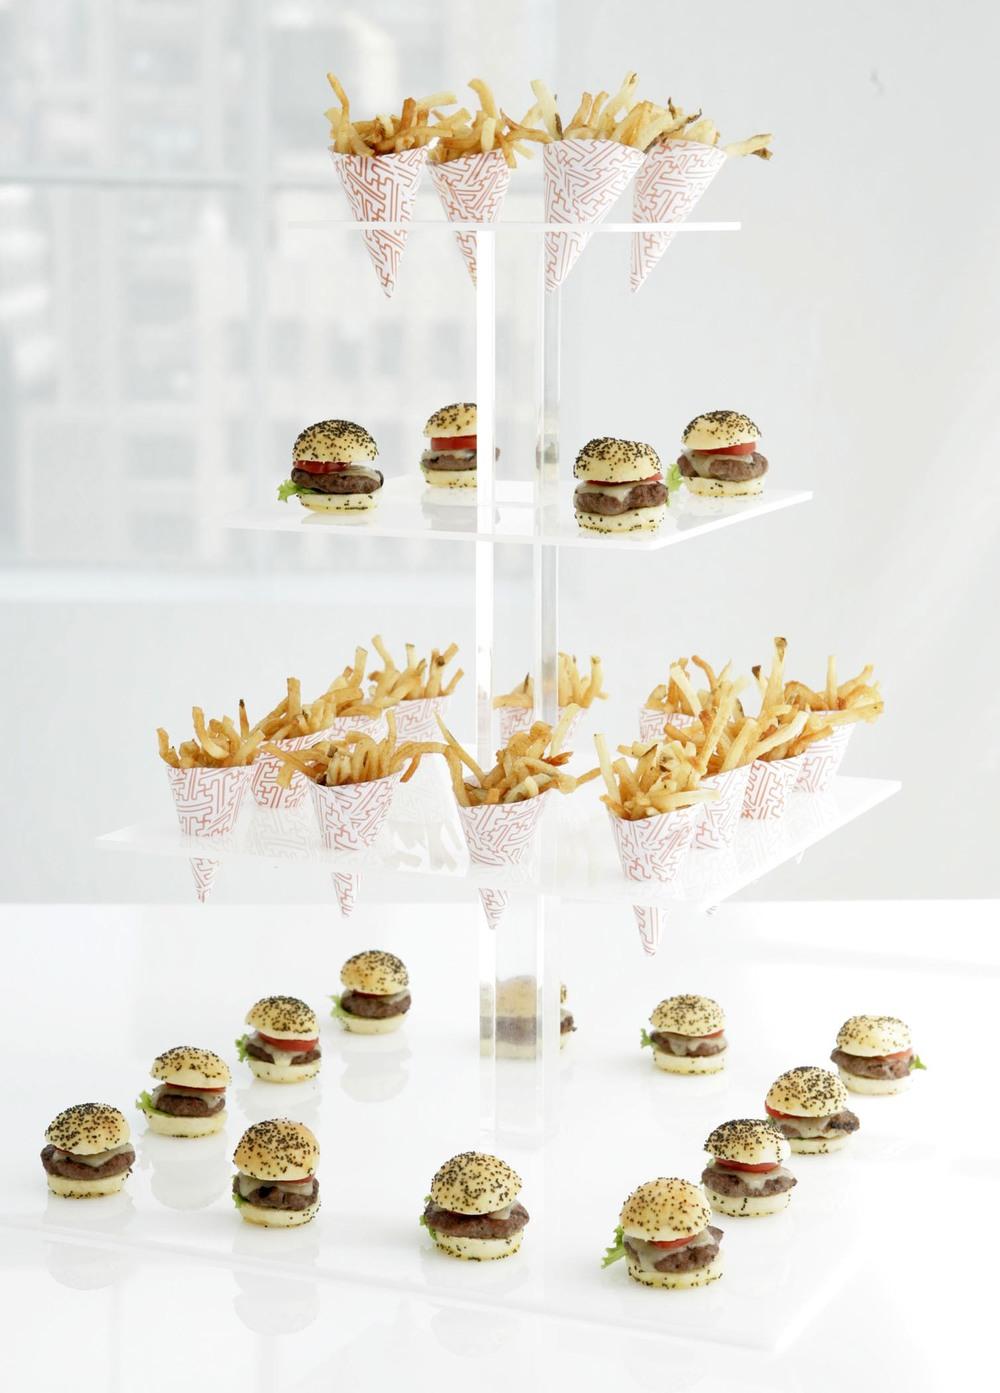 peter-callahan-cheeseburgers-and-frites.jpg